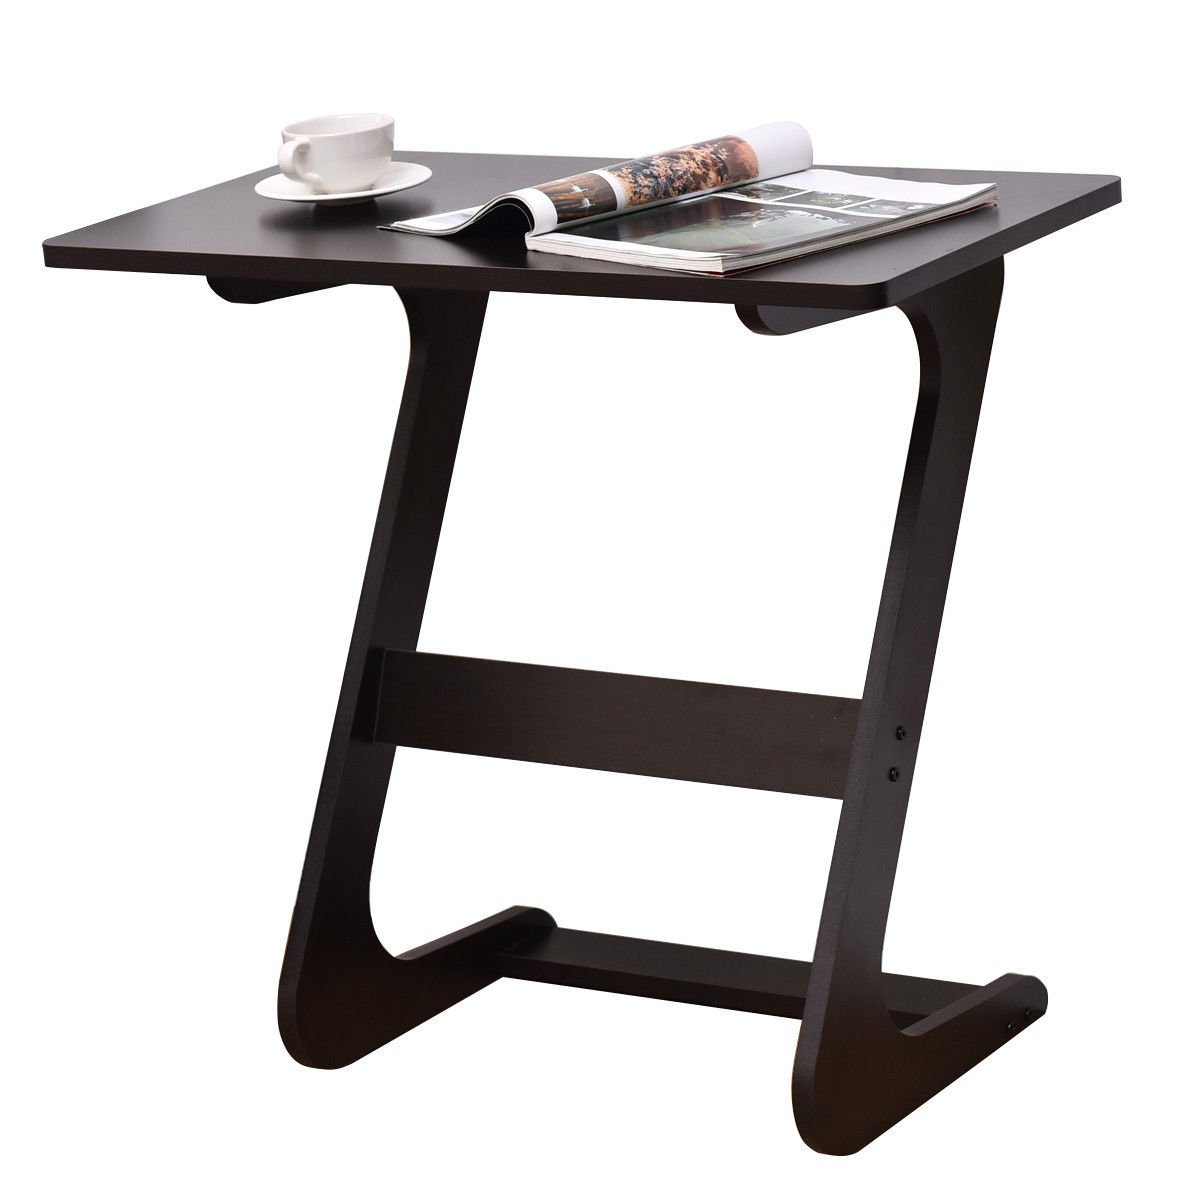 TANGKULA Sofa Table Z Style Portable Home Laptop Writing Wokstation TV Snack End Side Table Laptop Desk Coffee End Table Bed Side Snack Table (1, Wood Brown)